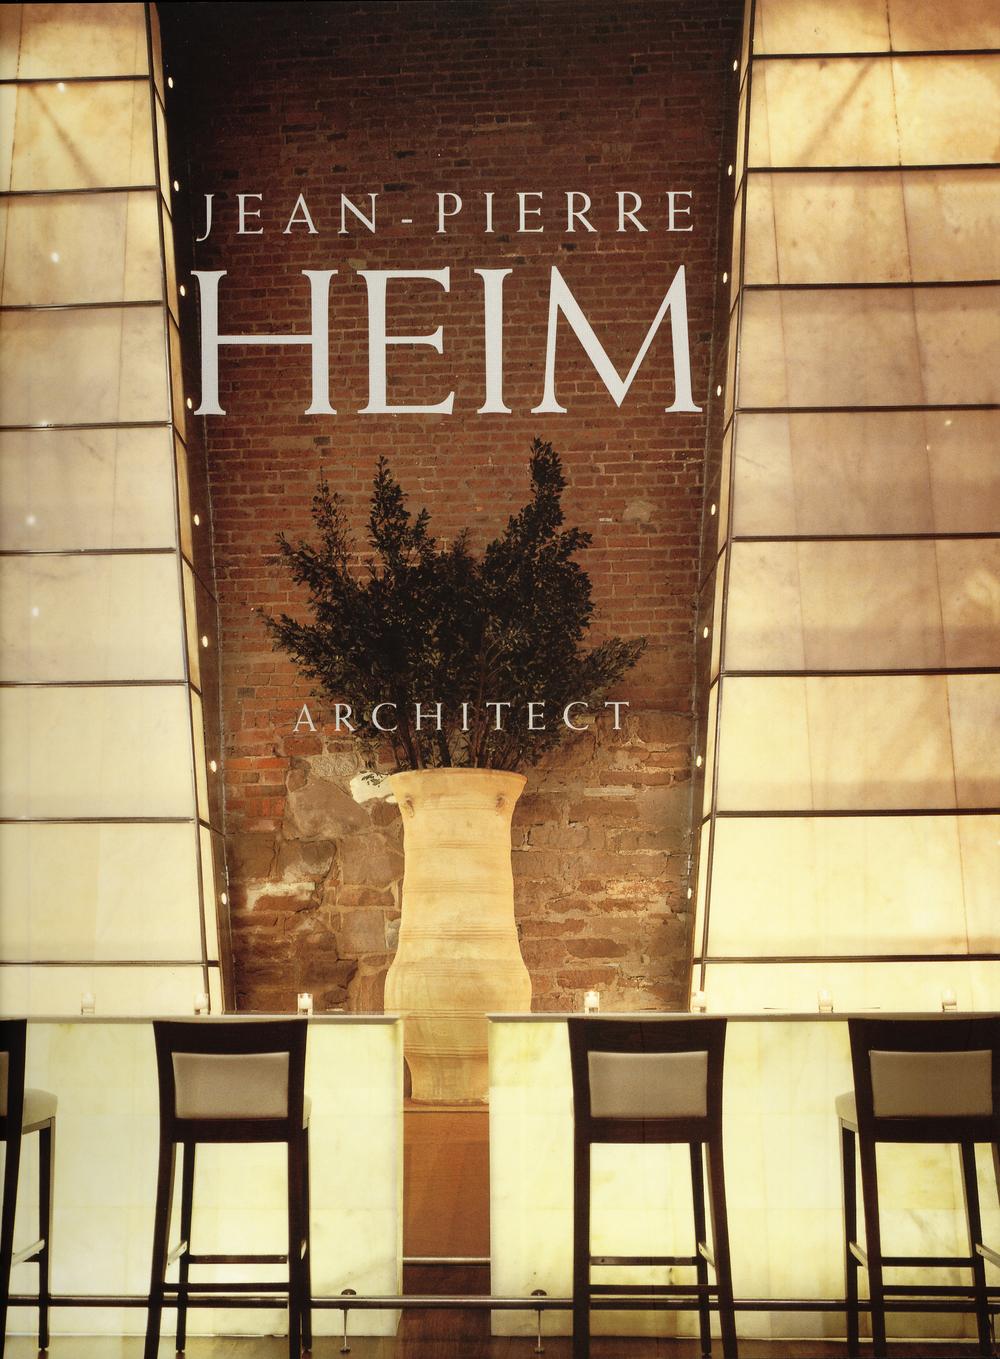 3 Jean Pierre Heim.jpg